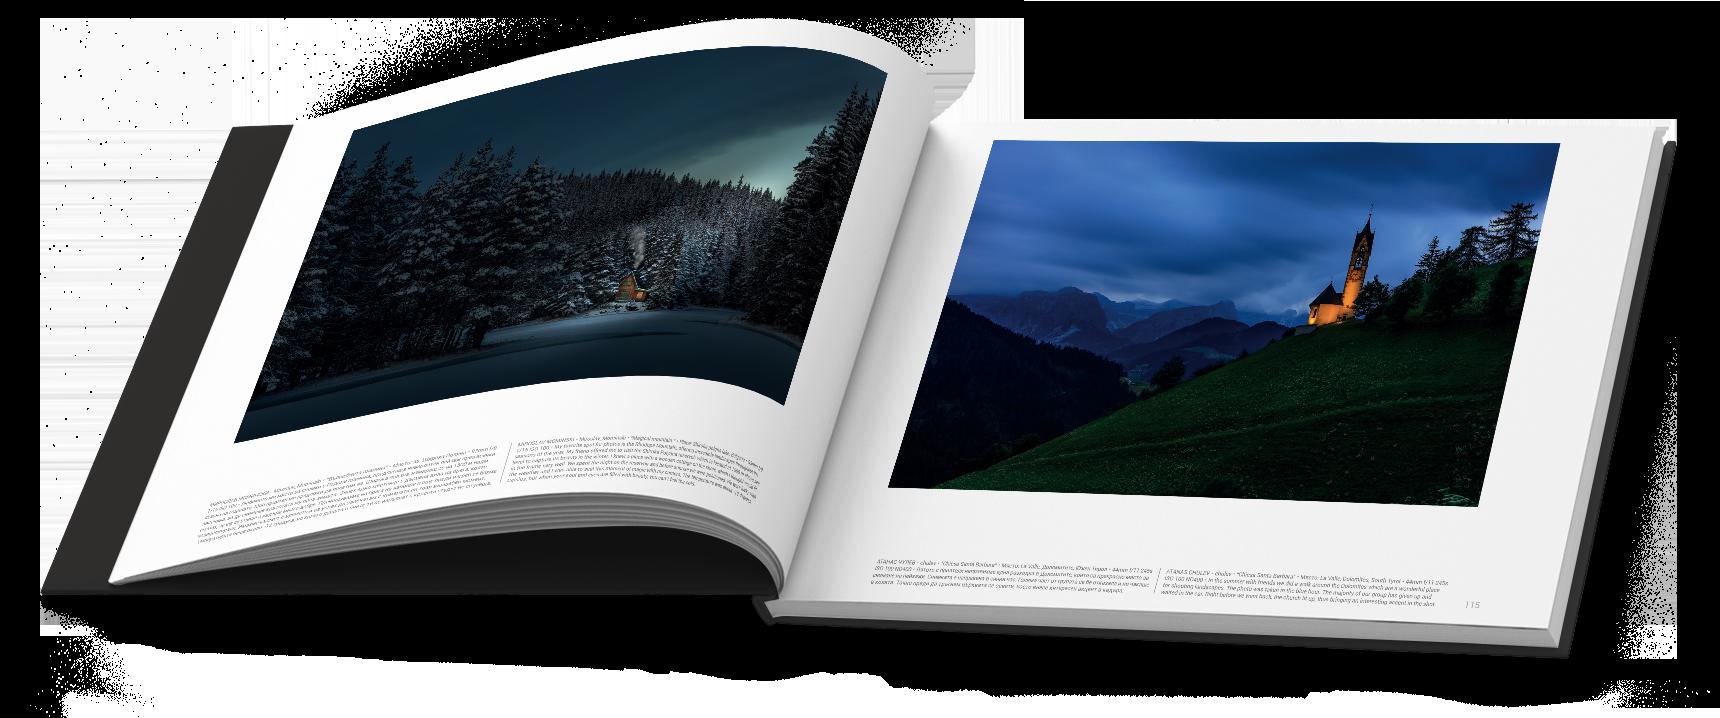 Фотографски Албум 2018 г. - Black&White &Color - страници 114-115